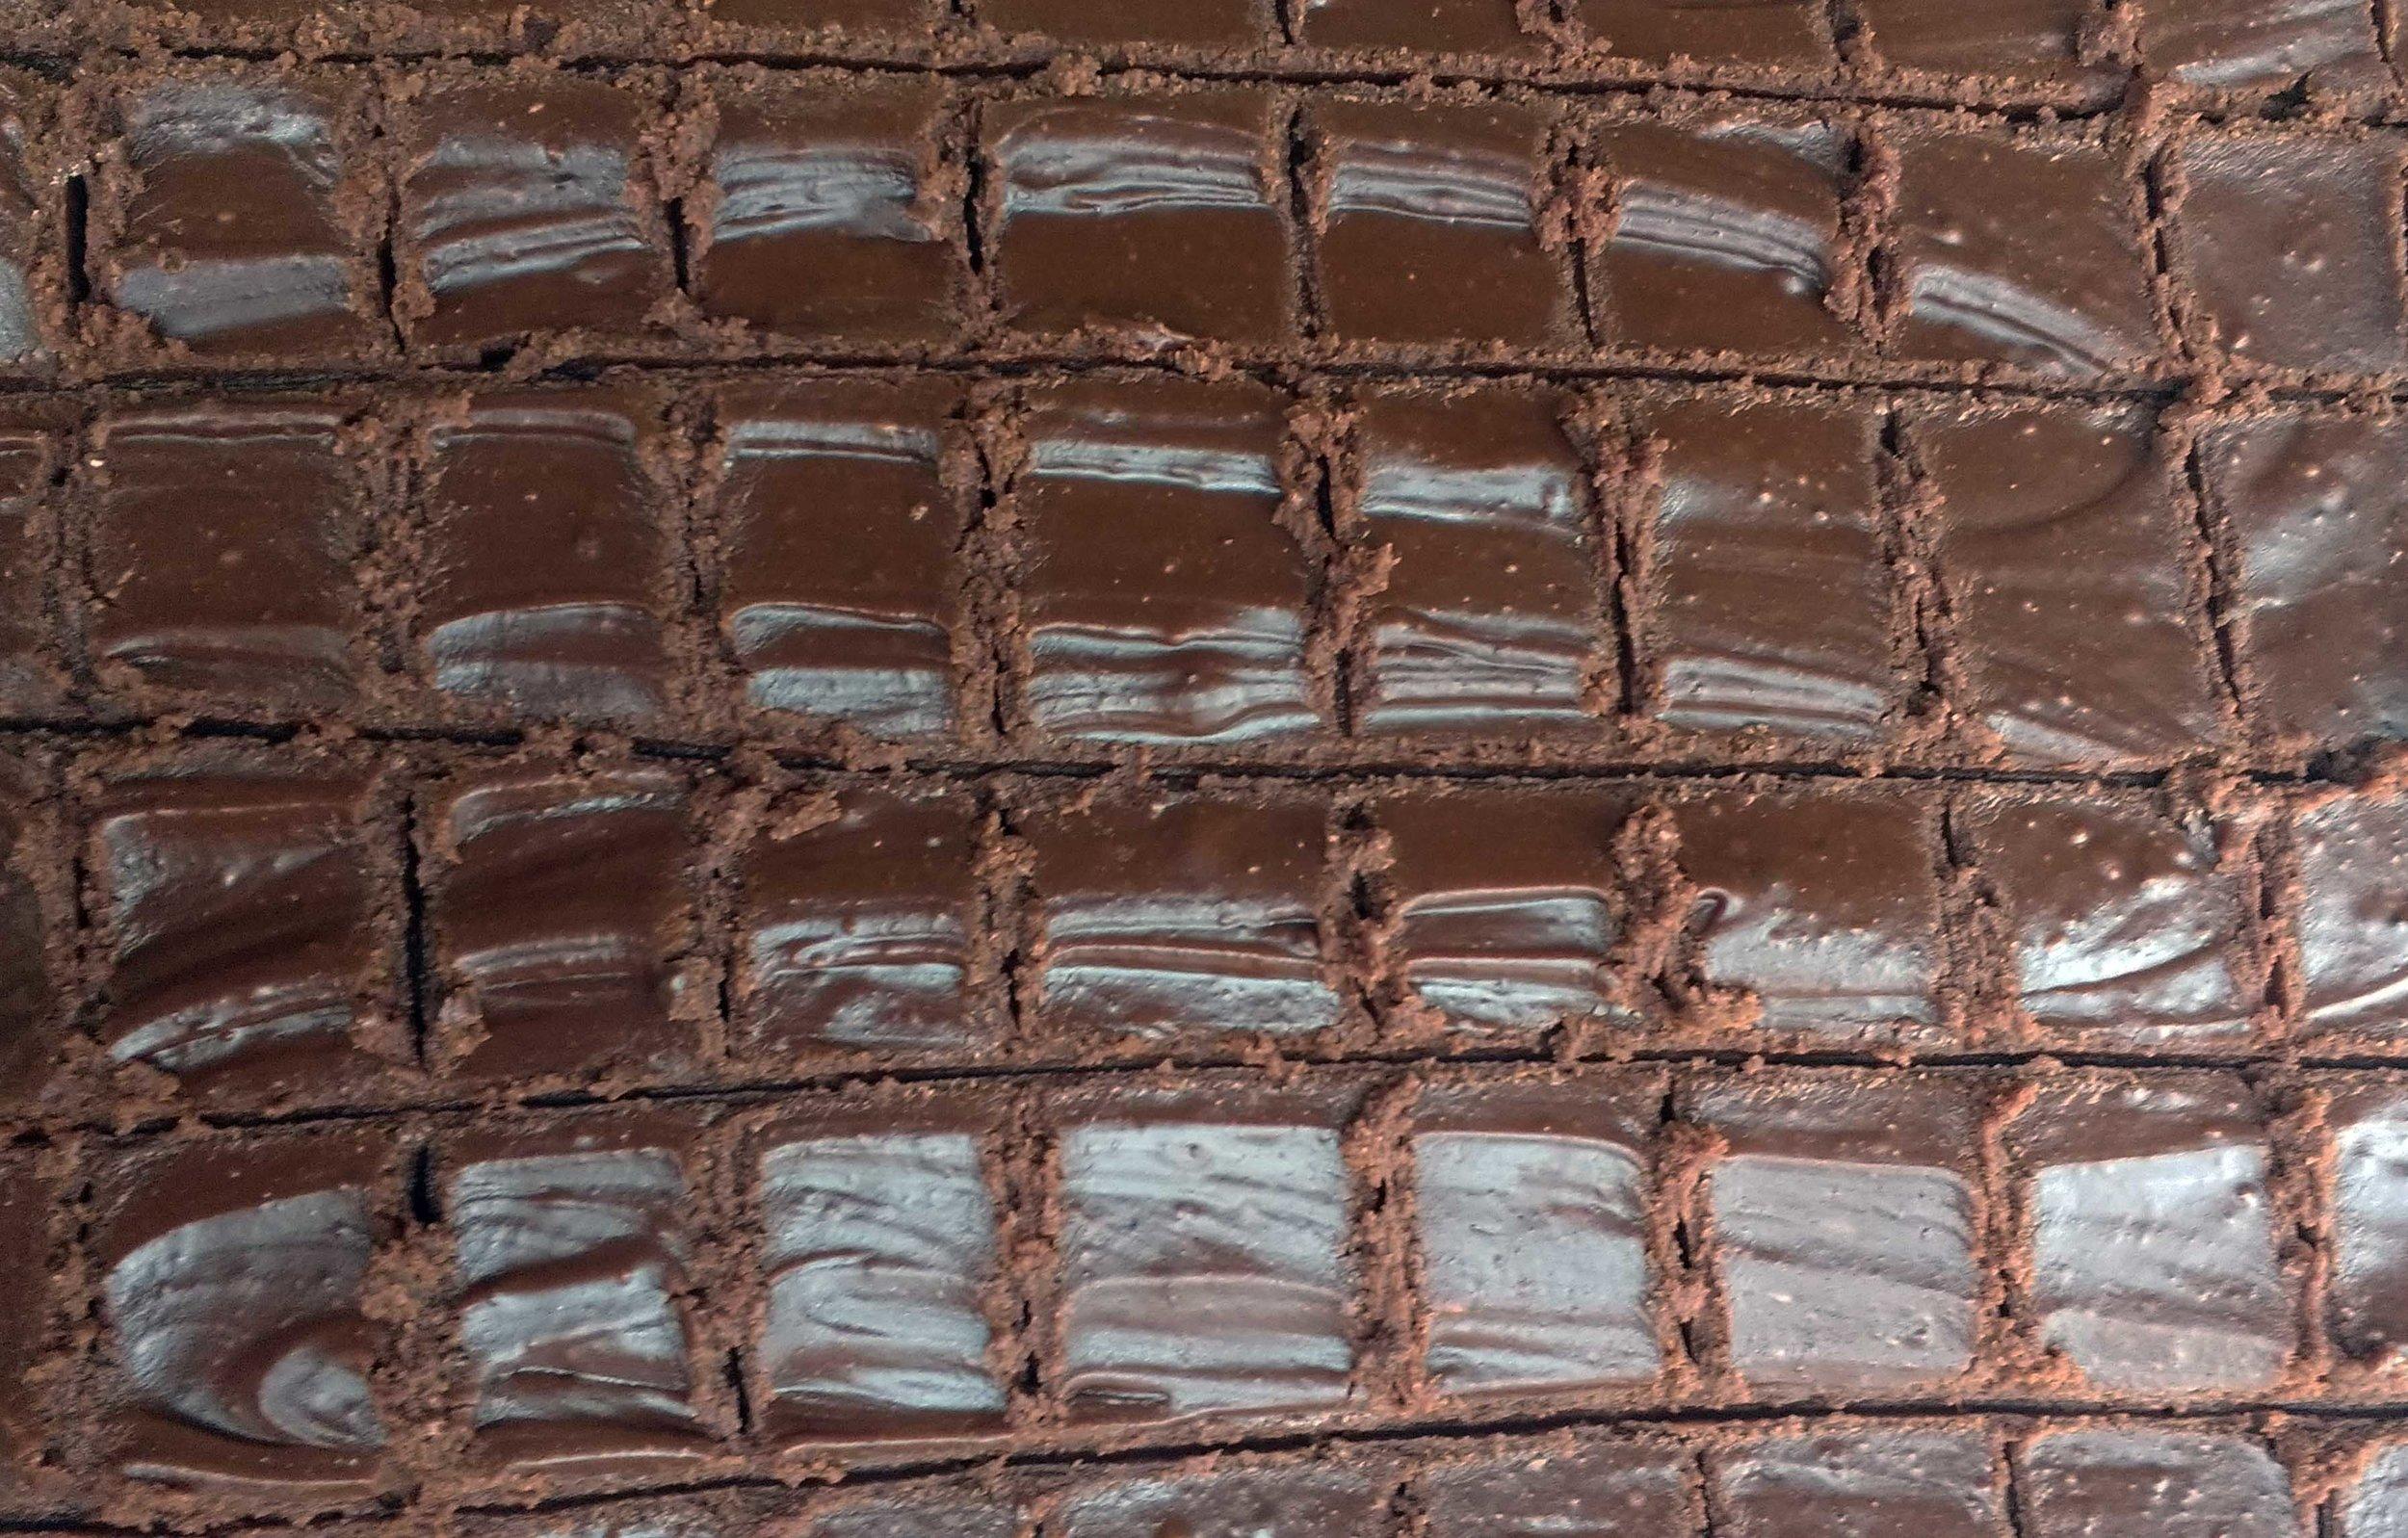 Perfectly textured rich dark chocolate fudge